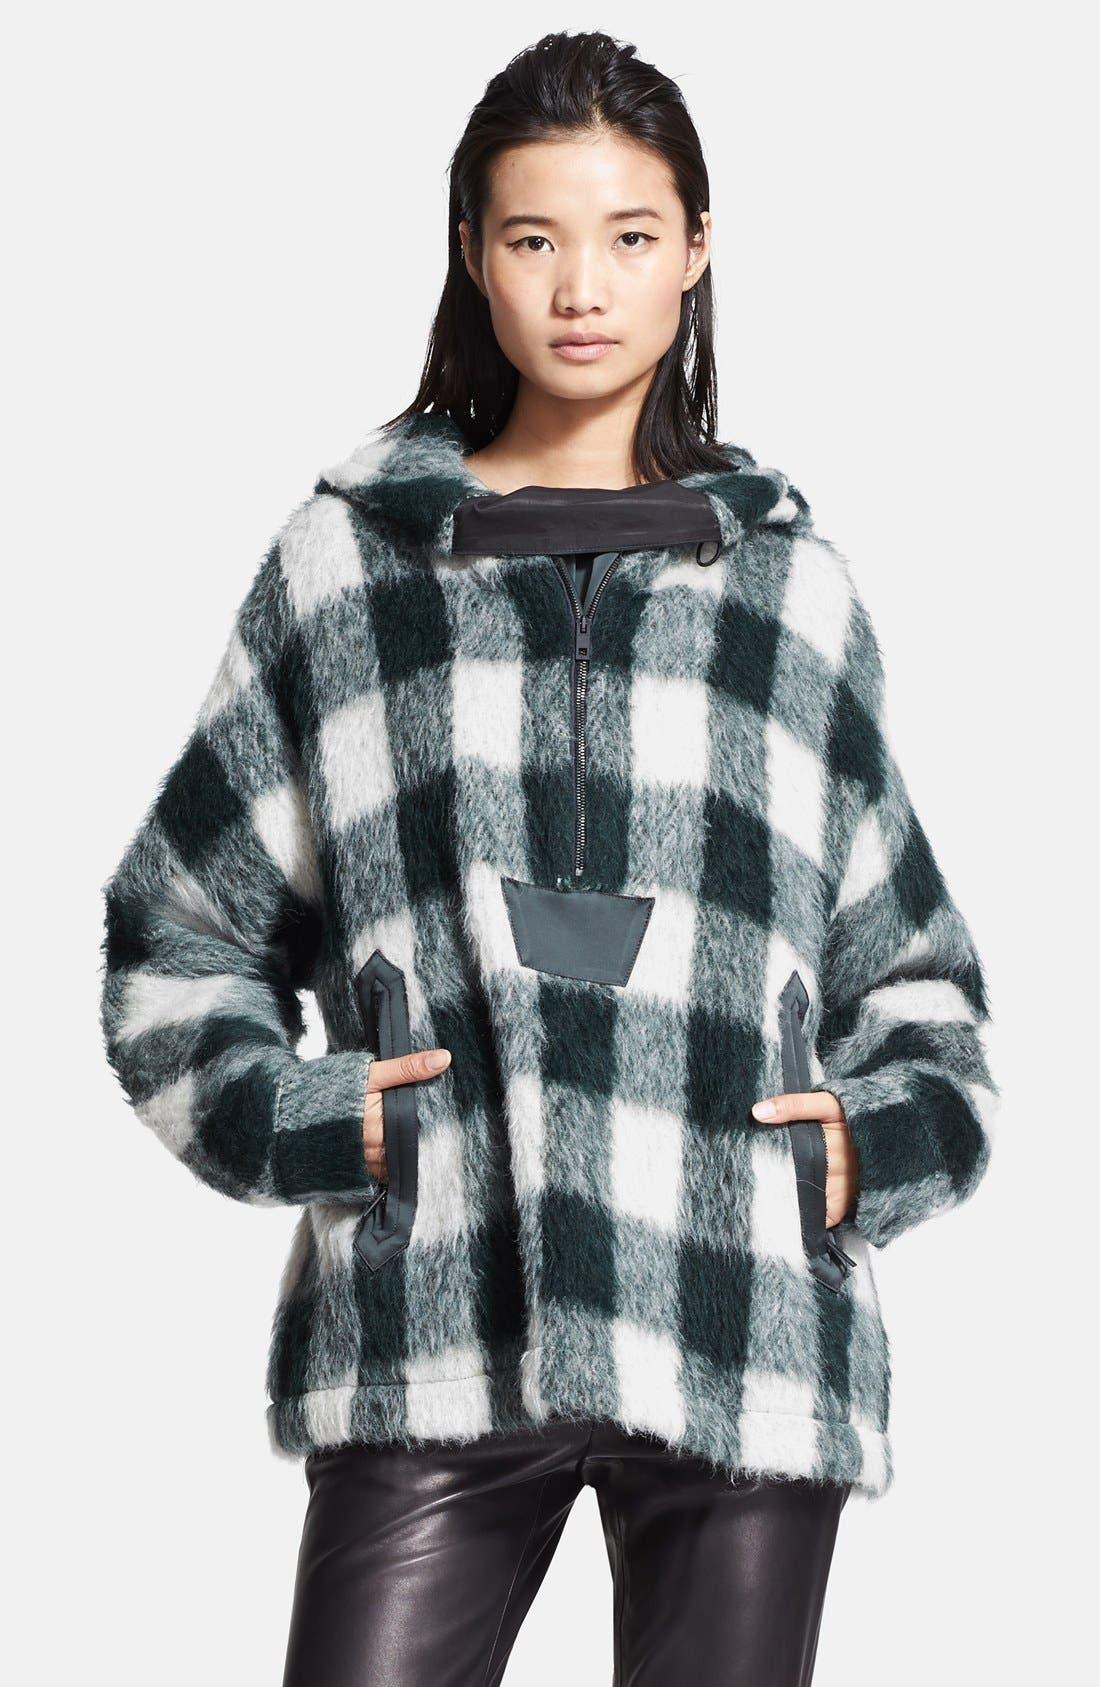 Alternate Image 1 Selected - rag & bone 'Falkland' Hooded Mohair Check Parka